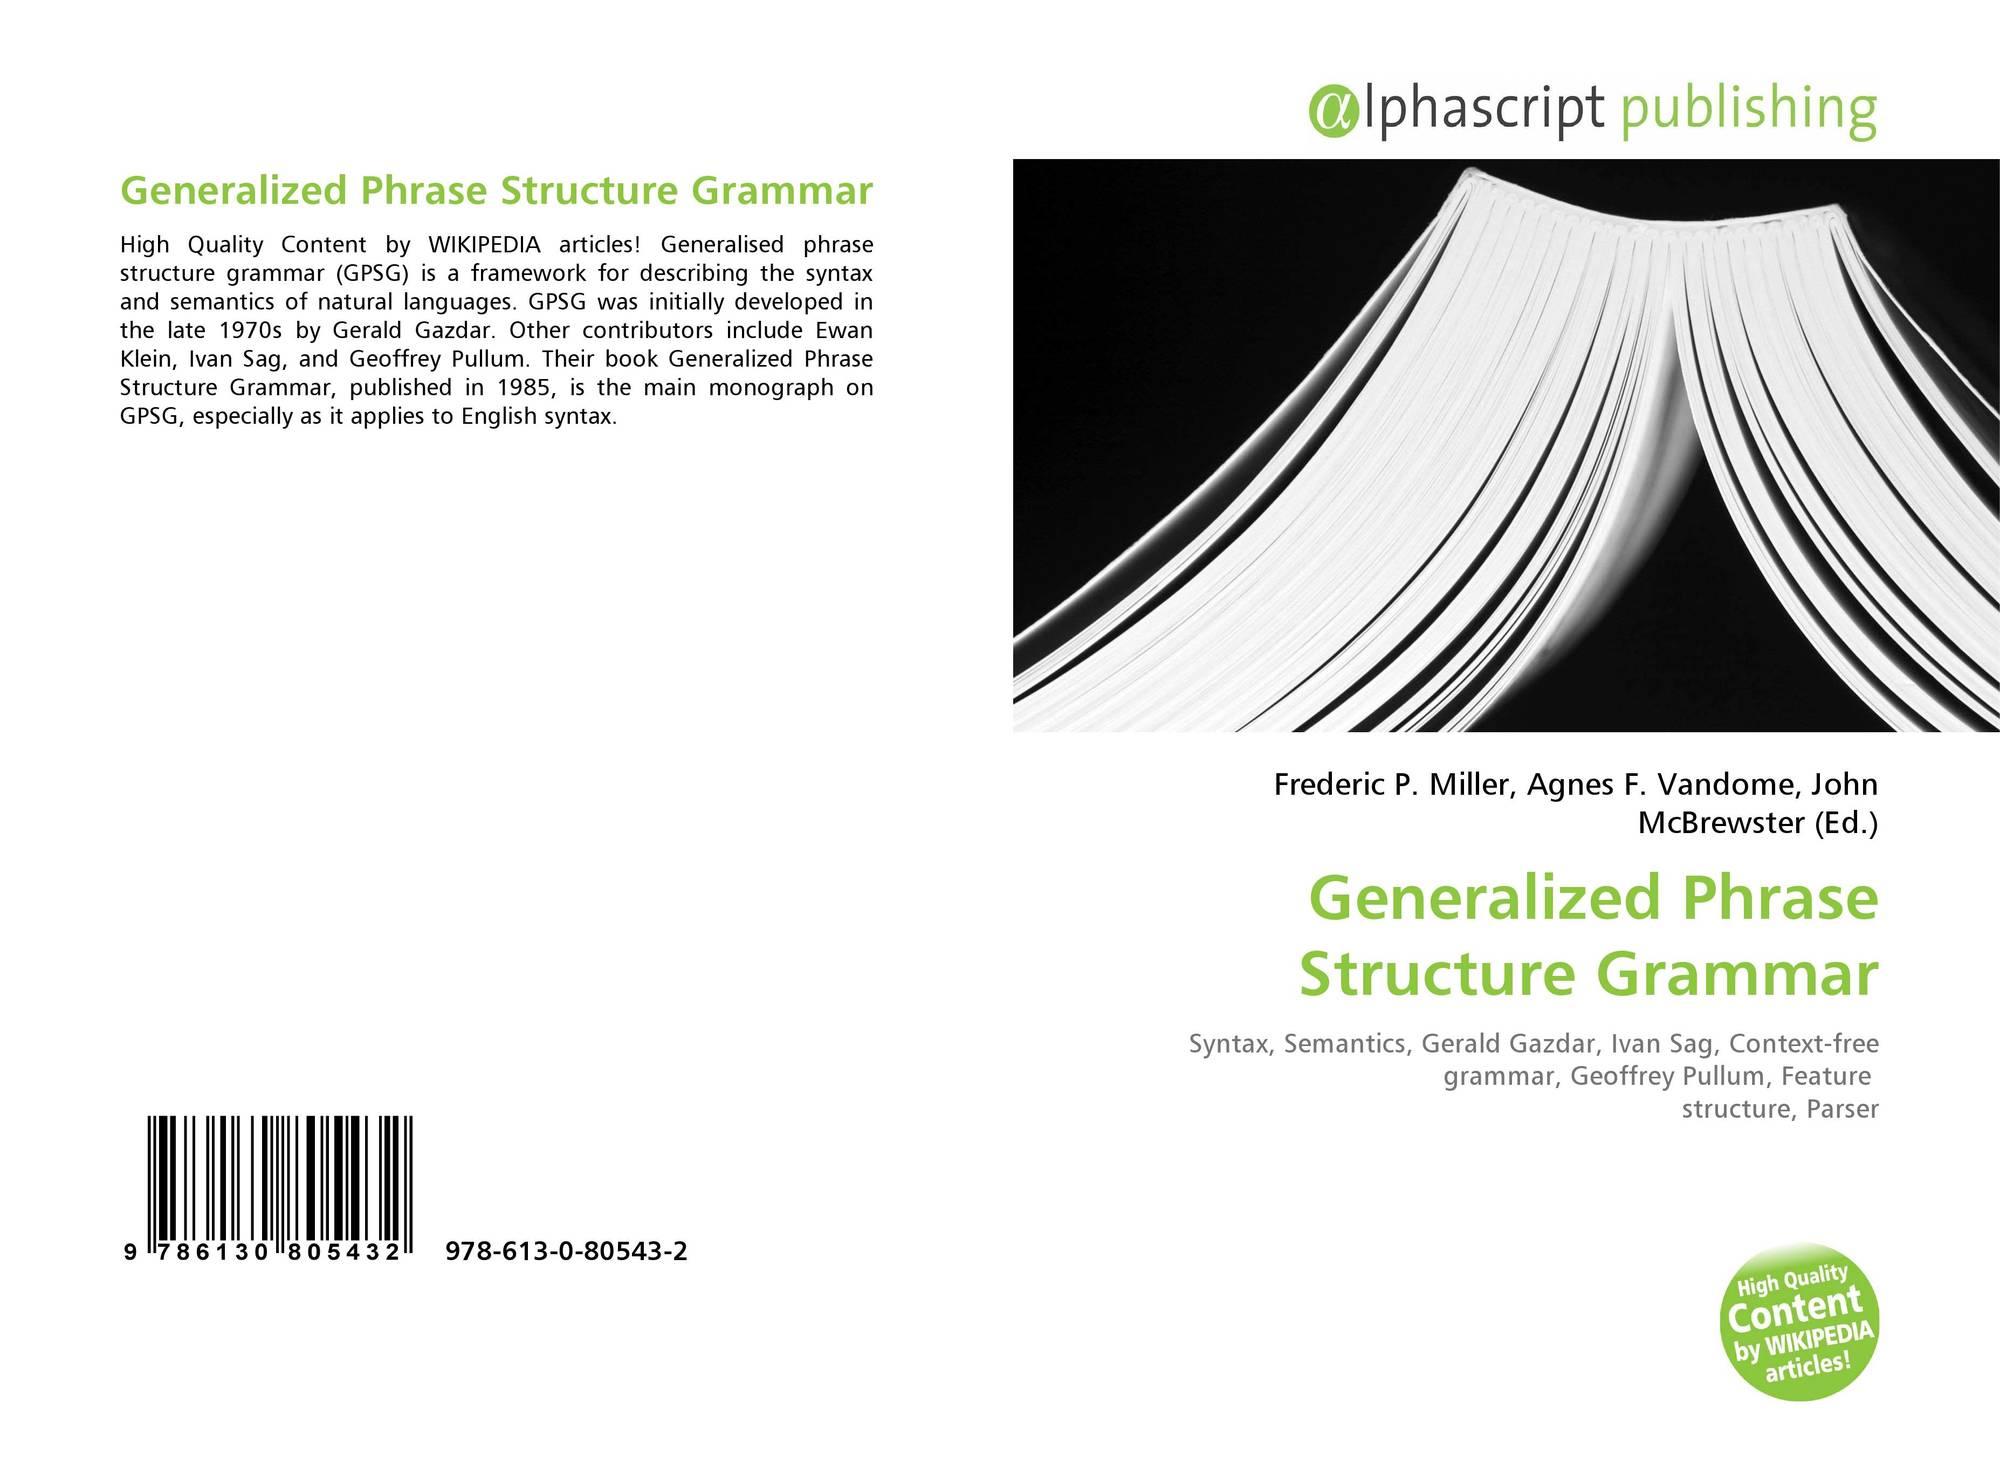 Generalized Phrase Structure Grammar, 978-613-0-80543-2